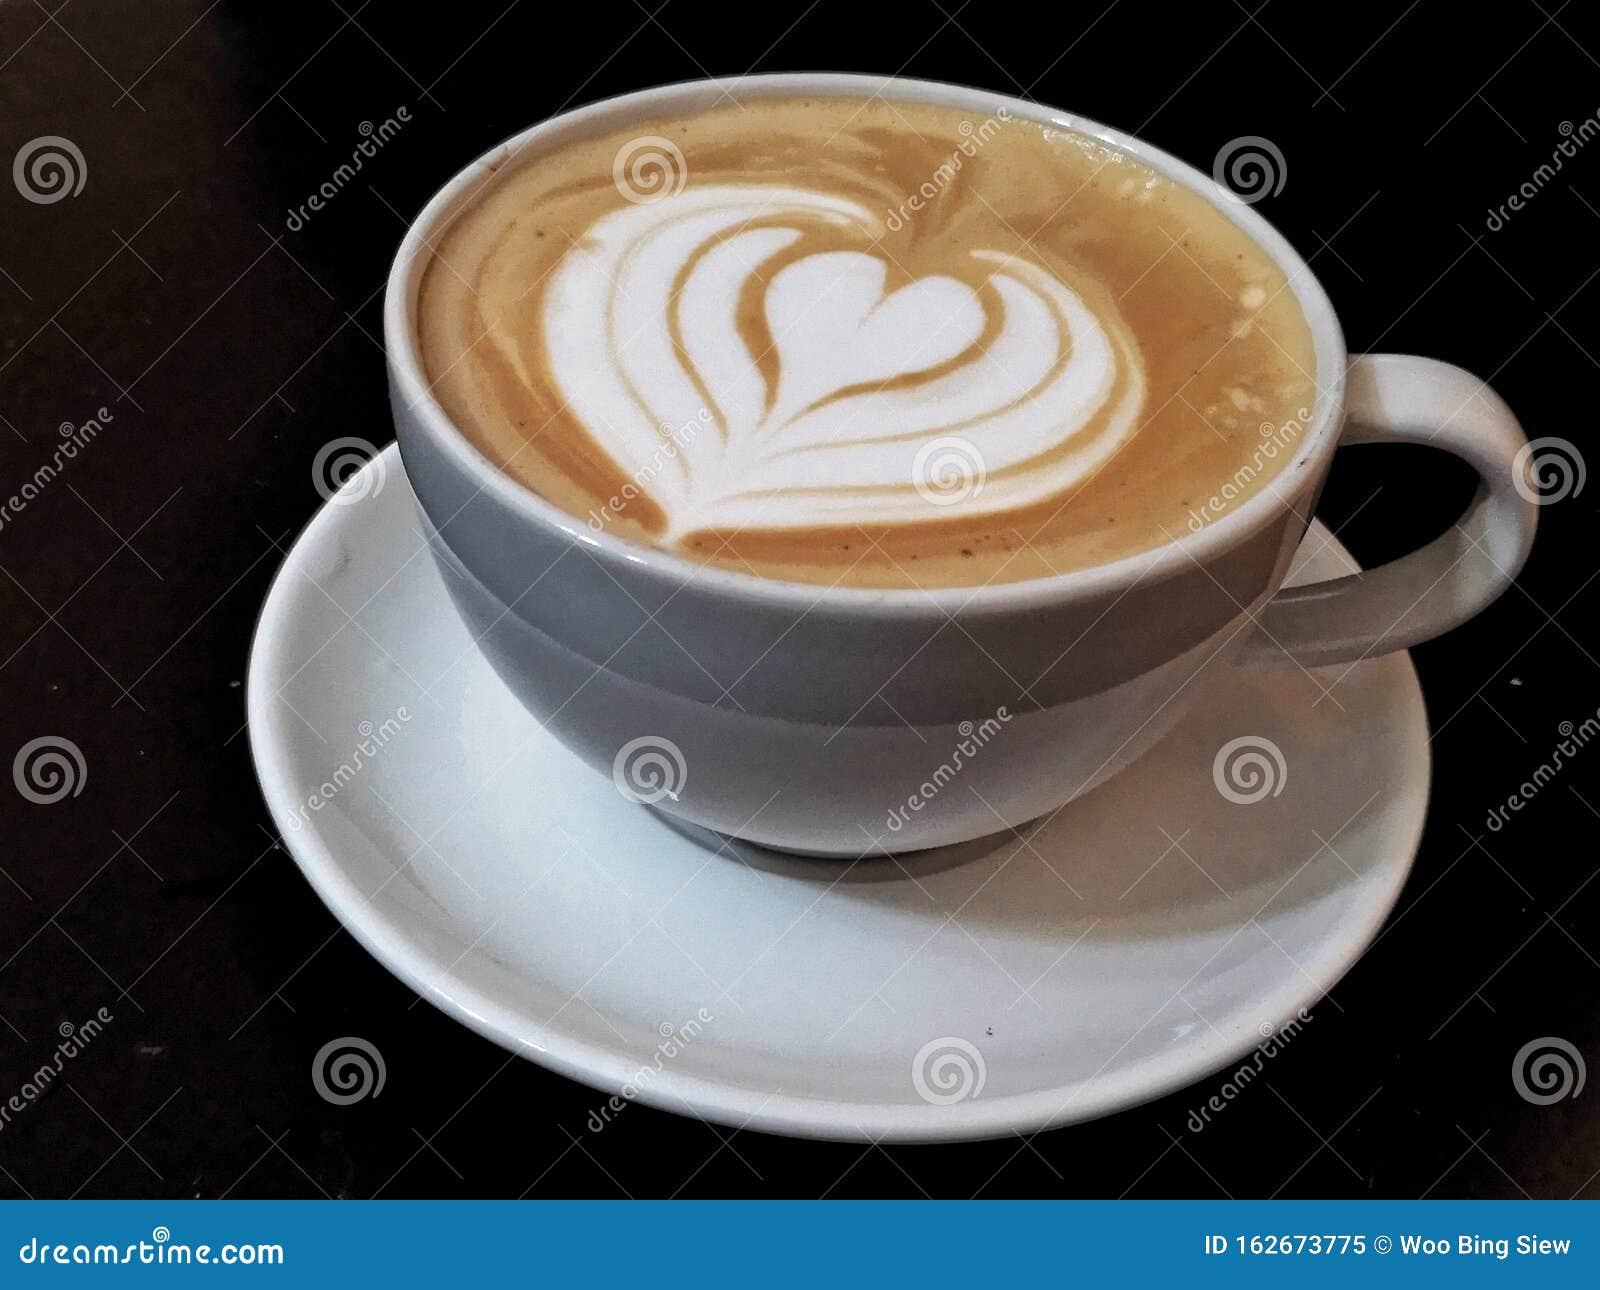 Coffee Latte Art Heart Shape Stock Image - Image of plate, latte: 162673775